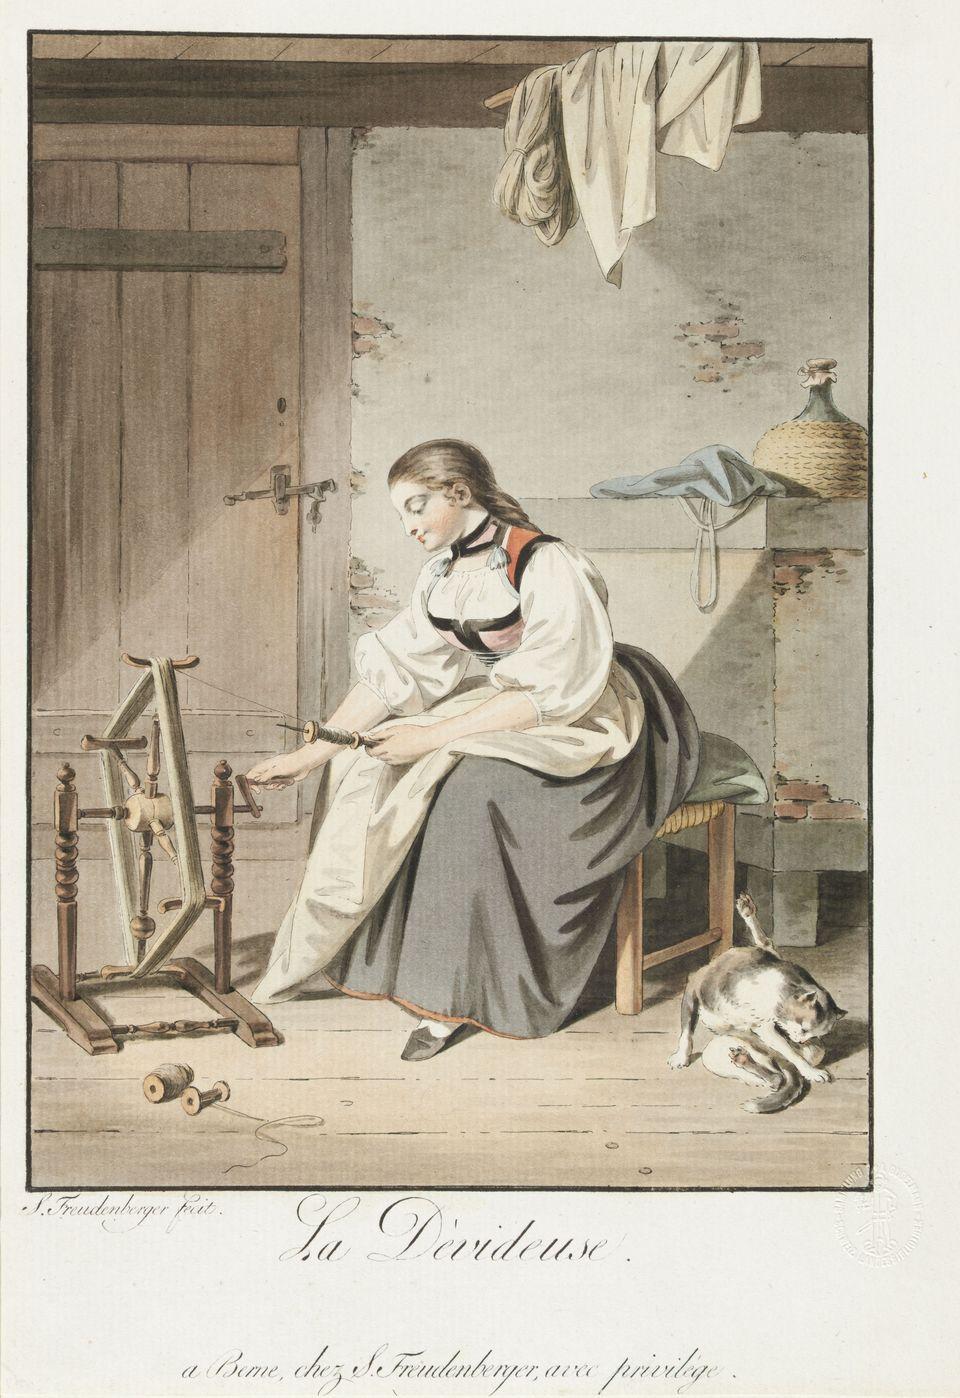 Sigmund Freudenberger 1794 La devideuse